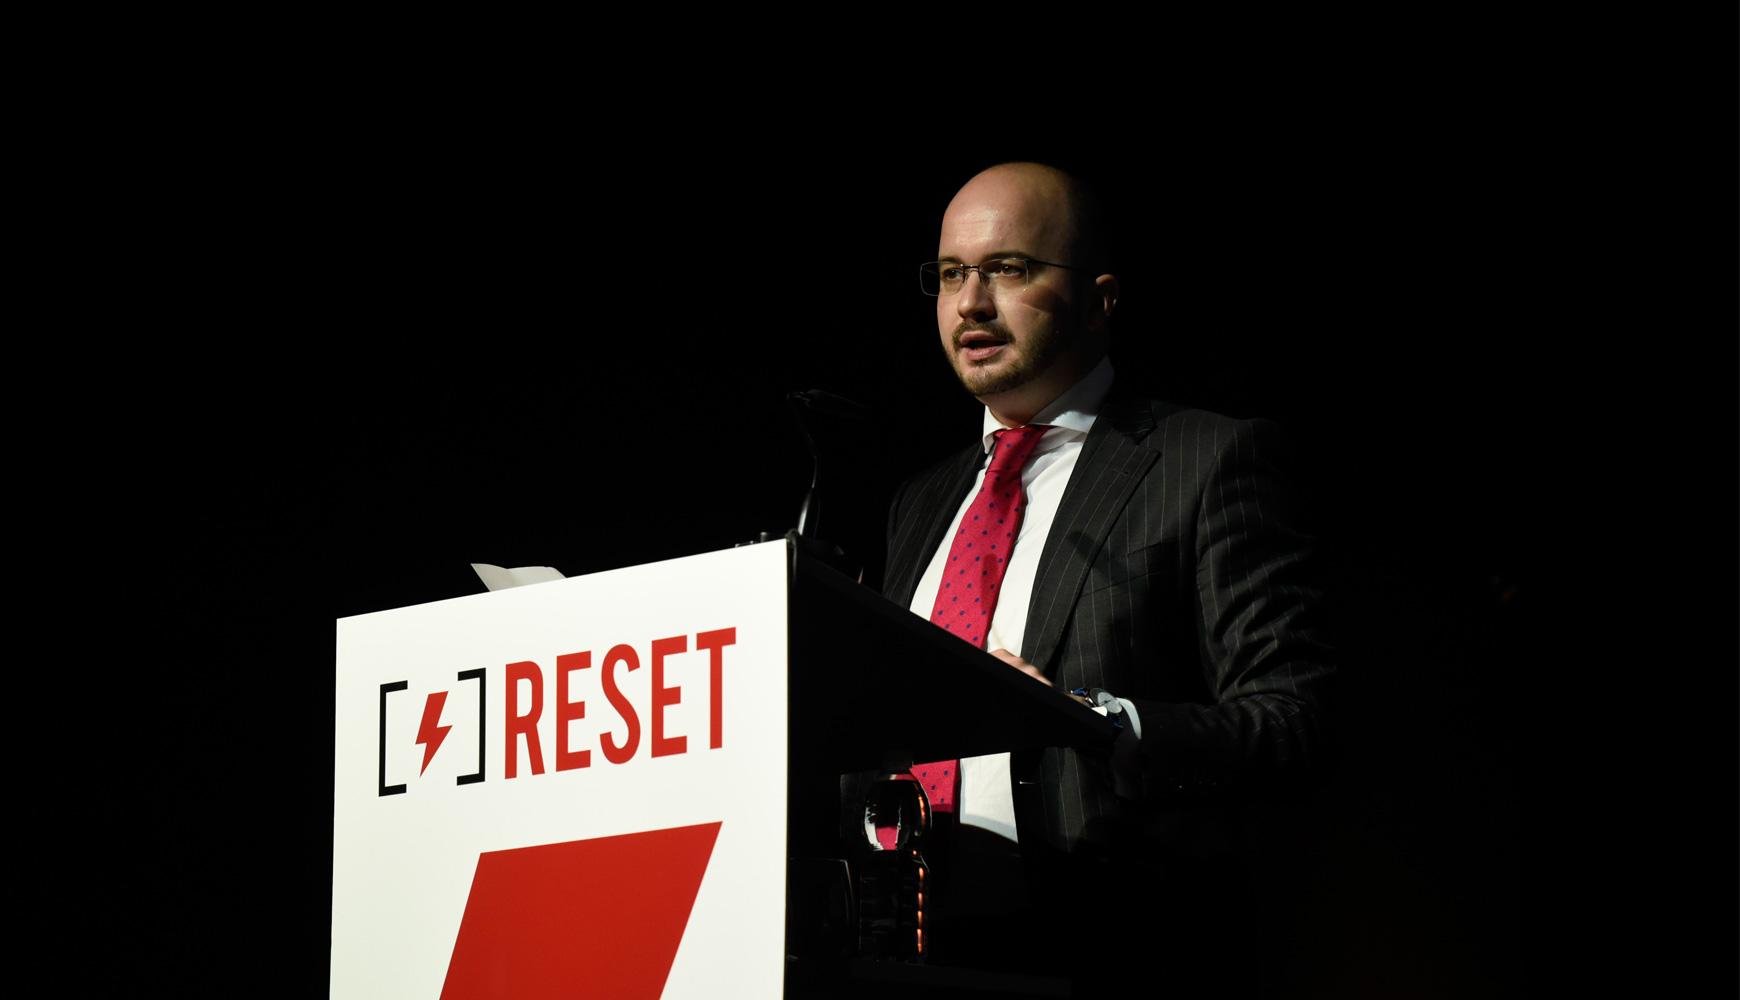 Inauguración del XX Congreso Nacional Reset celebrado en Marbella